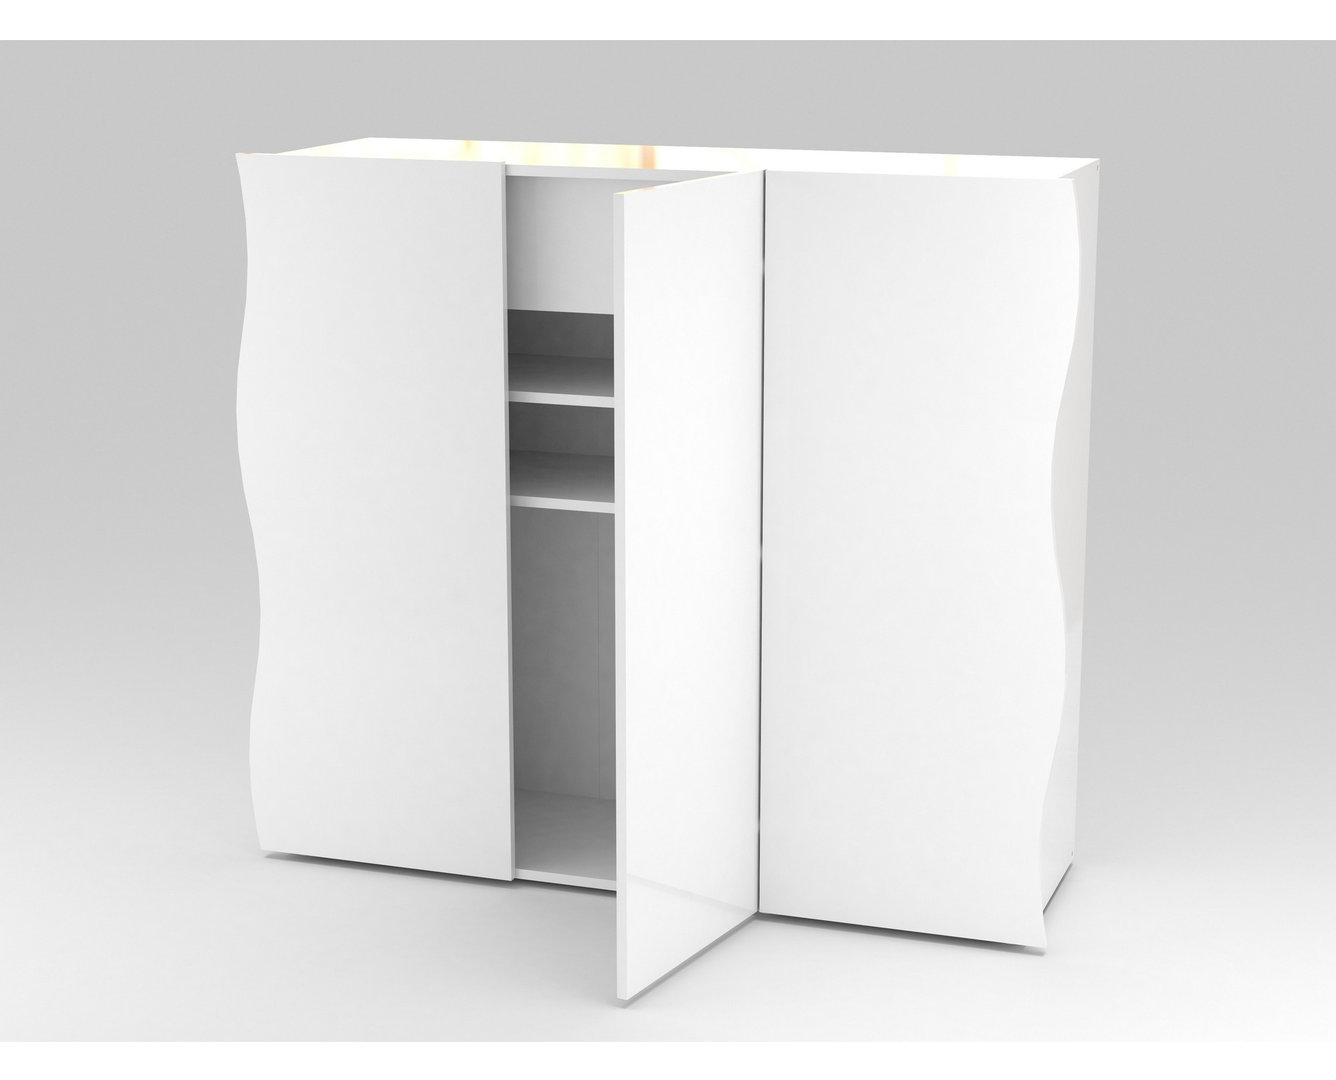 Entrata moderna goccia xl mobili per ingresso - Mobili ingresso con scarpiera ...